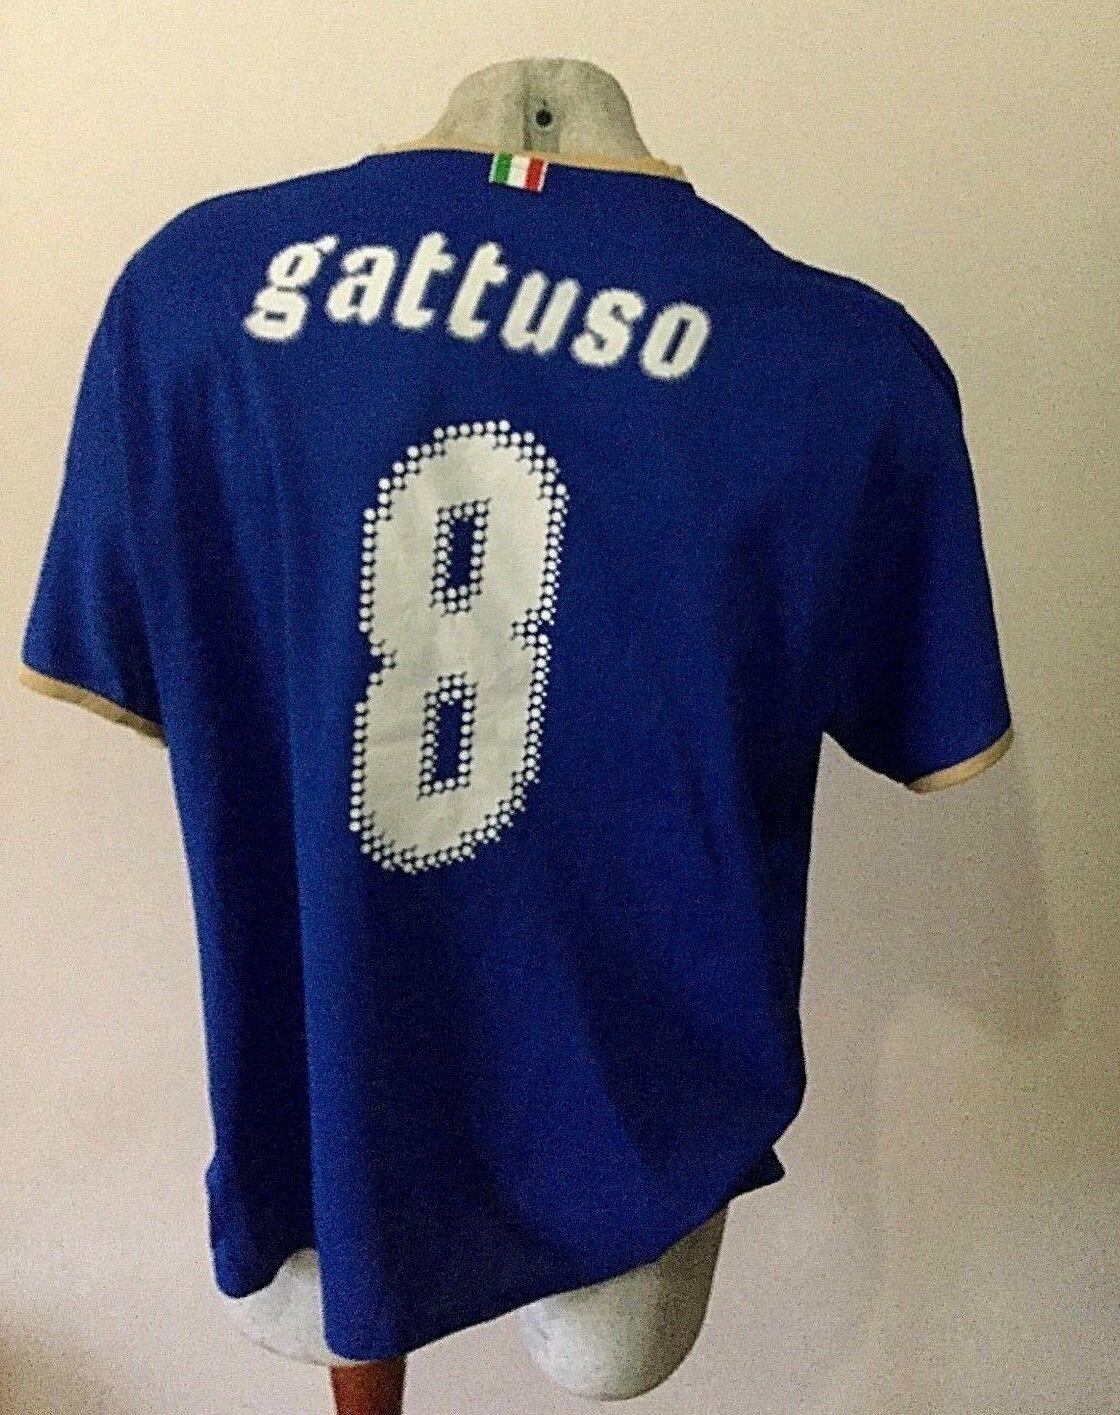 Maglia calcio puma italia gattuso milan 2009 trikot football shirt jersey XXL